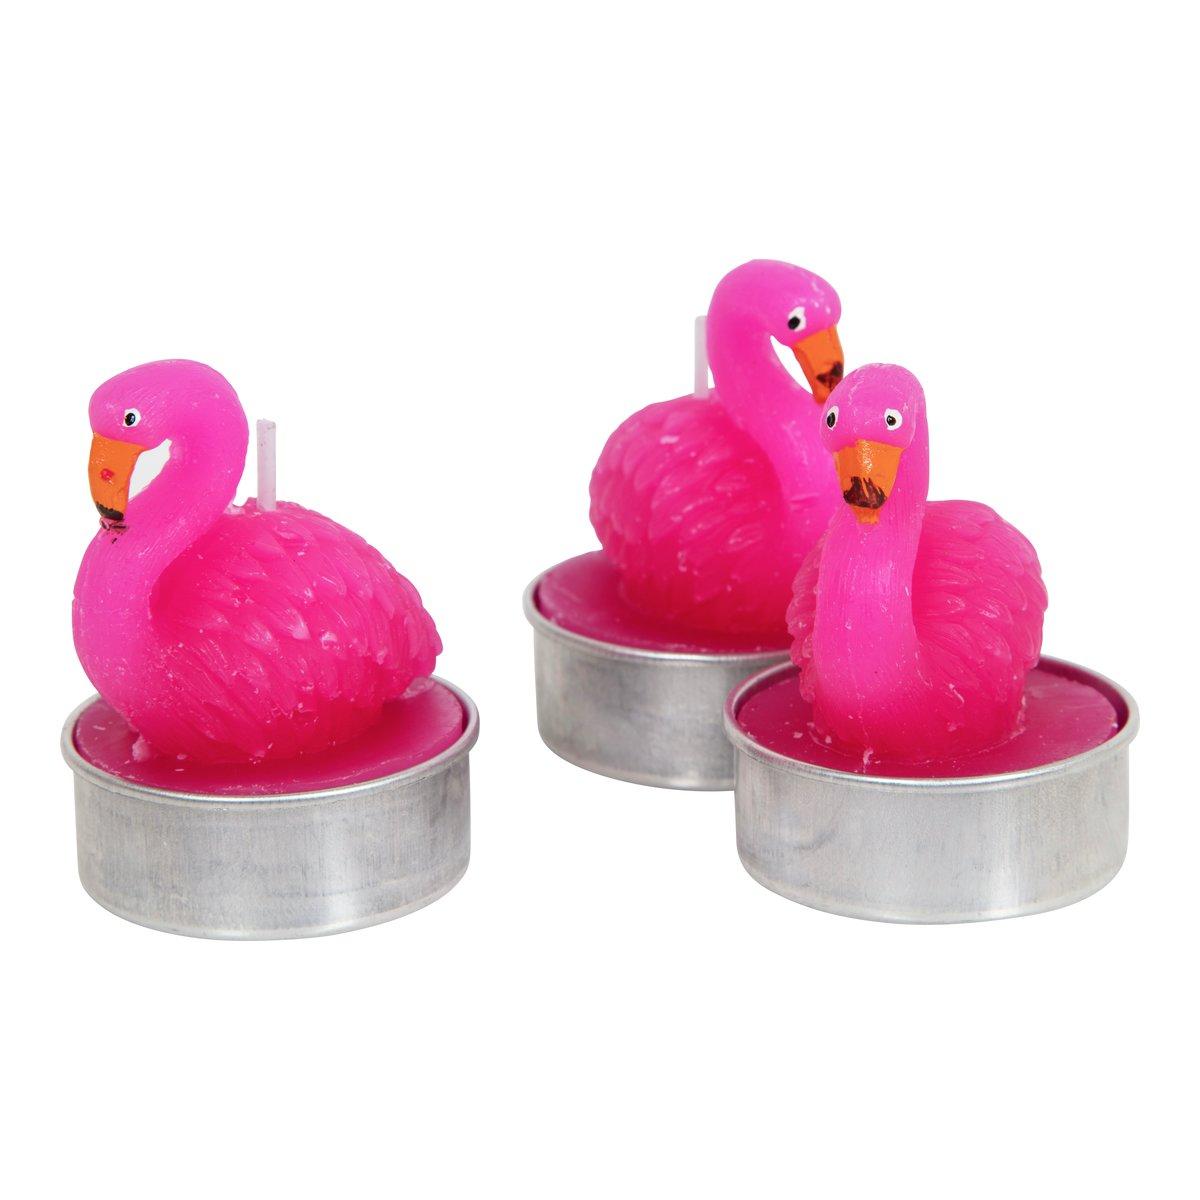 Figurtelys flamingo 3pk-STE5245